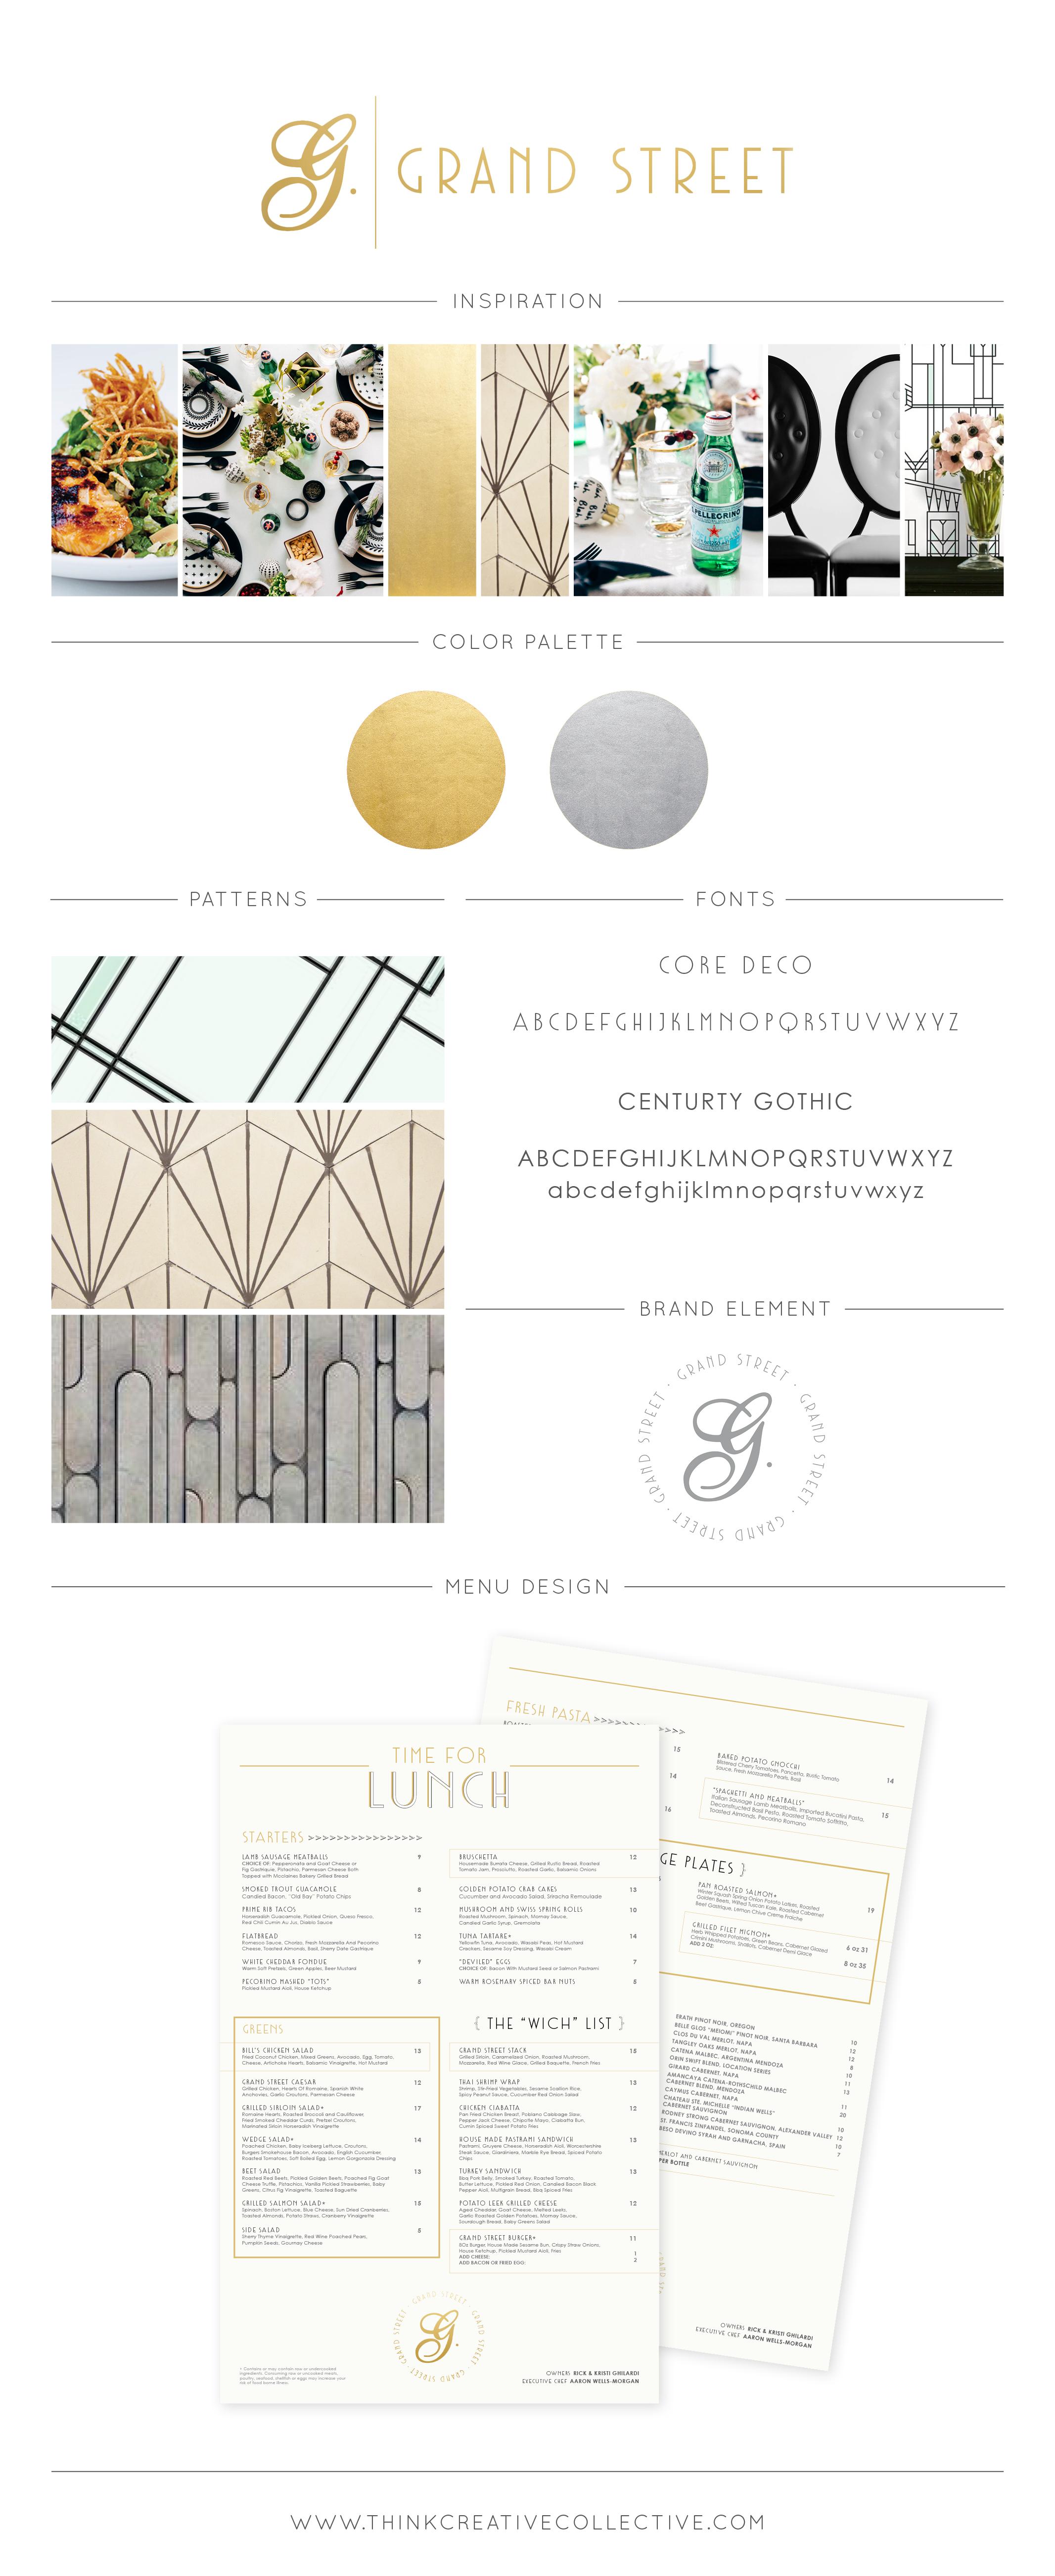 Grand Street     Restaurant & Fine Dinning Re-Brand     Menu Design     Think Creative Collective